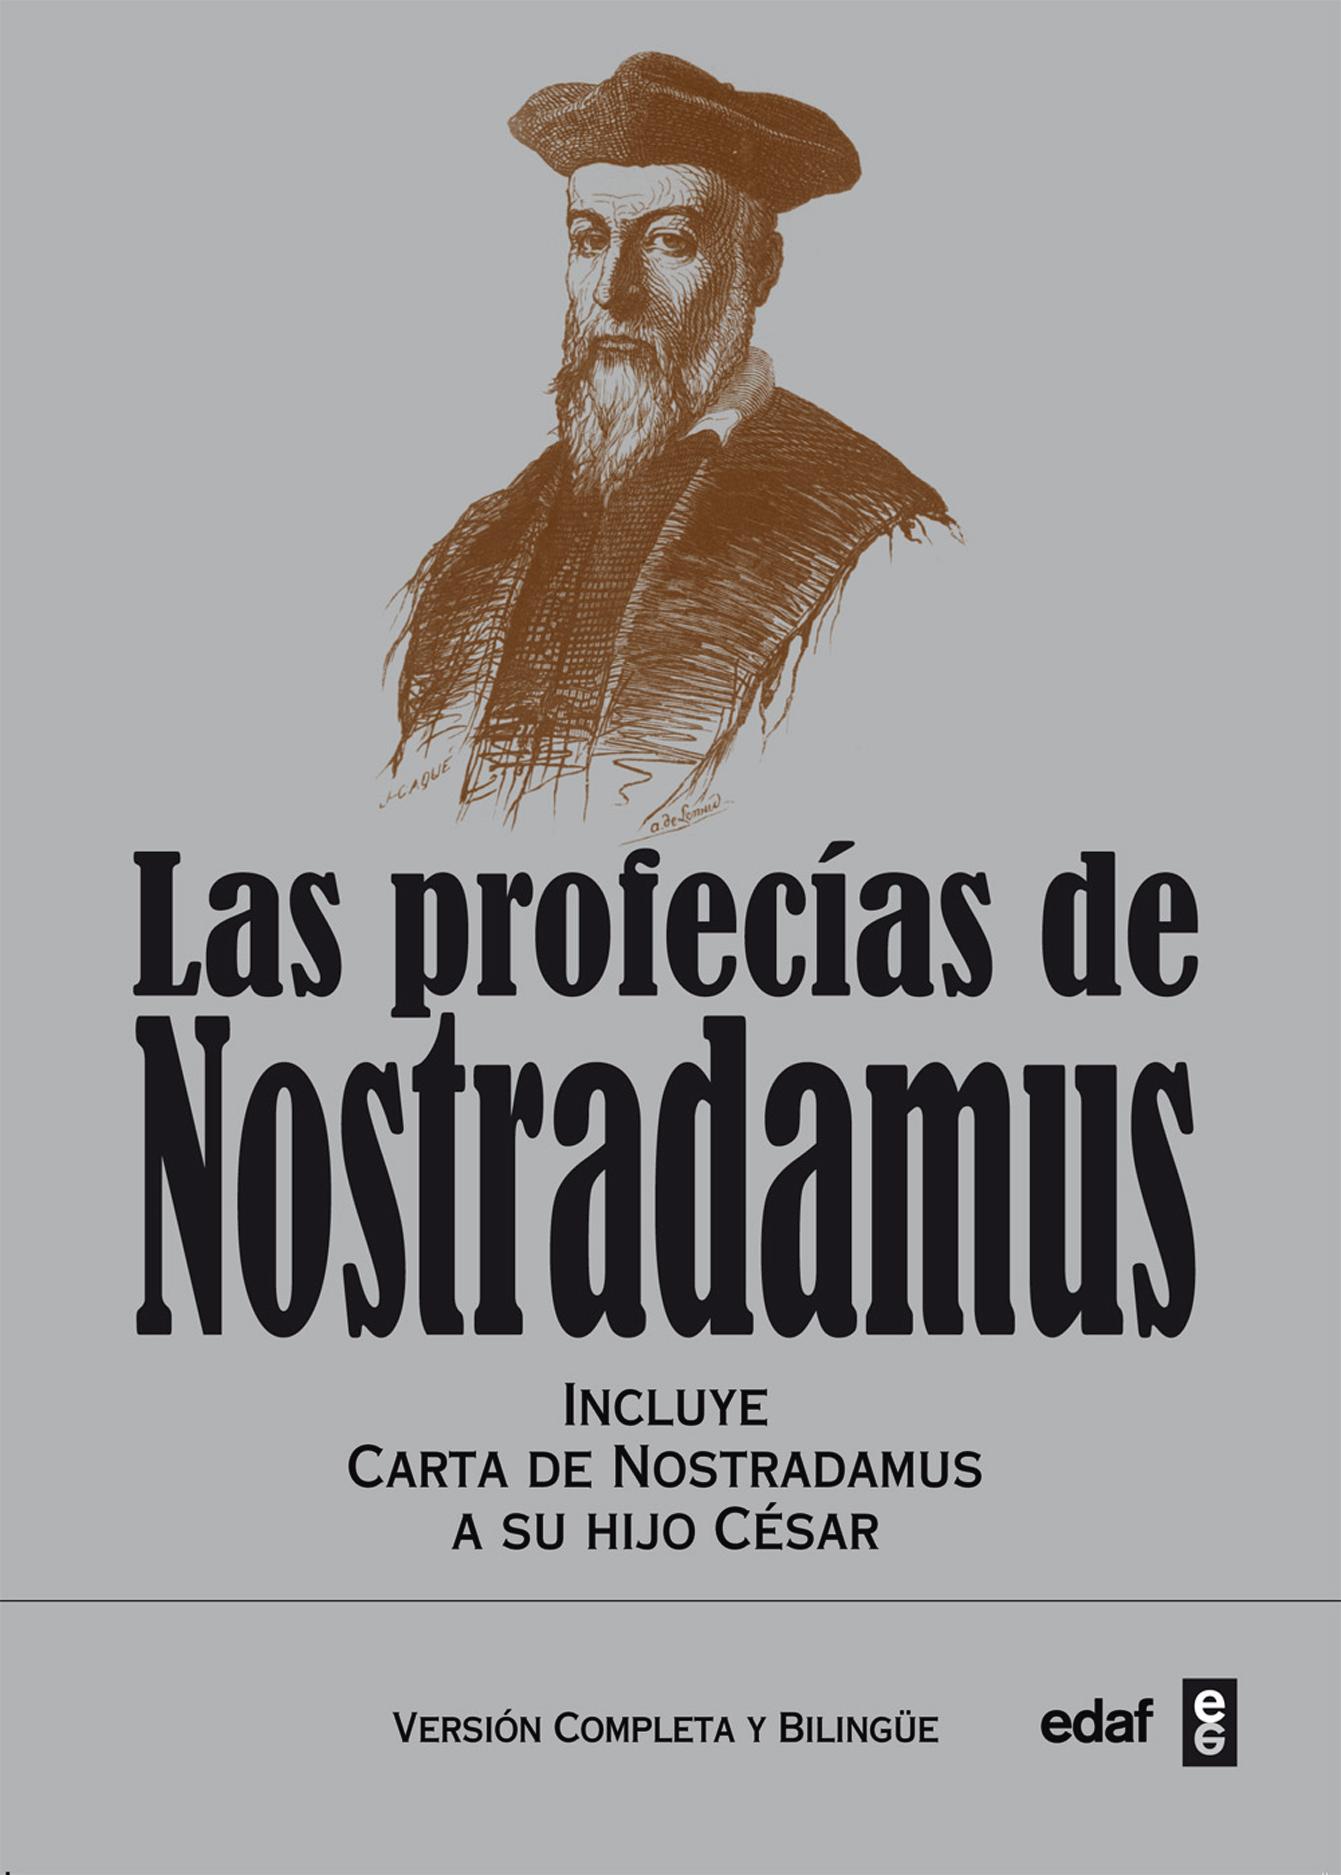 Las profecías de Nostradamus - cover